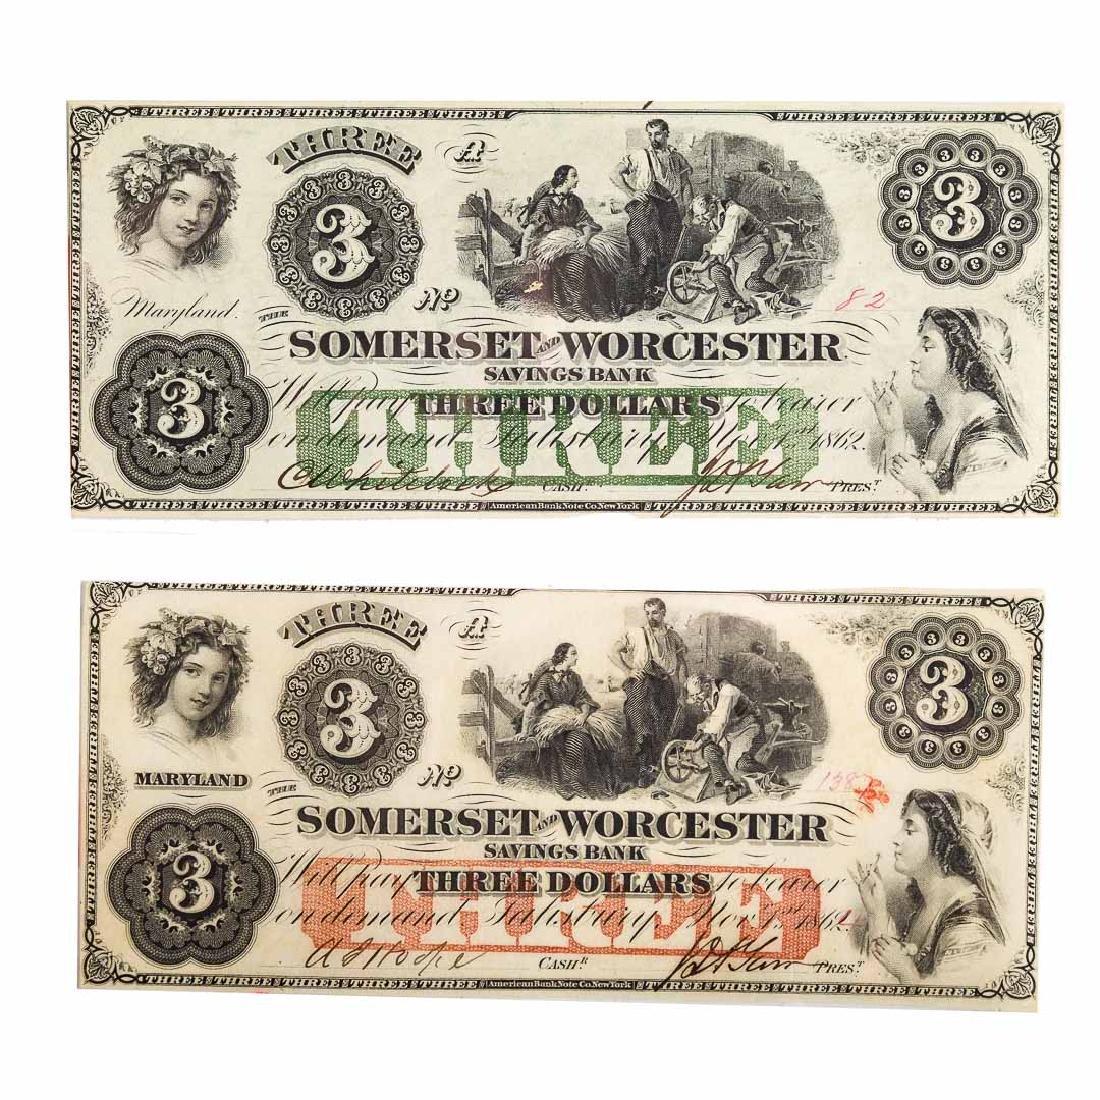 [US] Two $3 1862 Somerset & Worcester Higher Grade